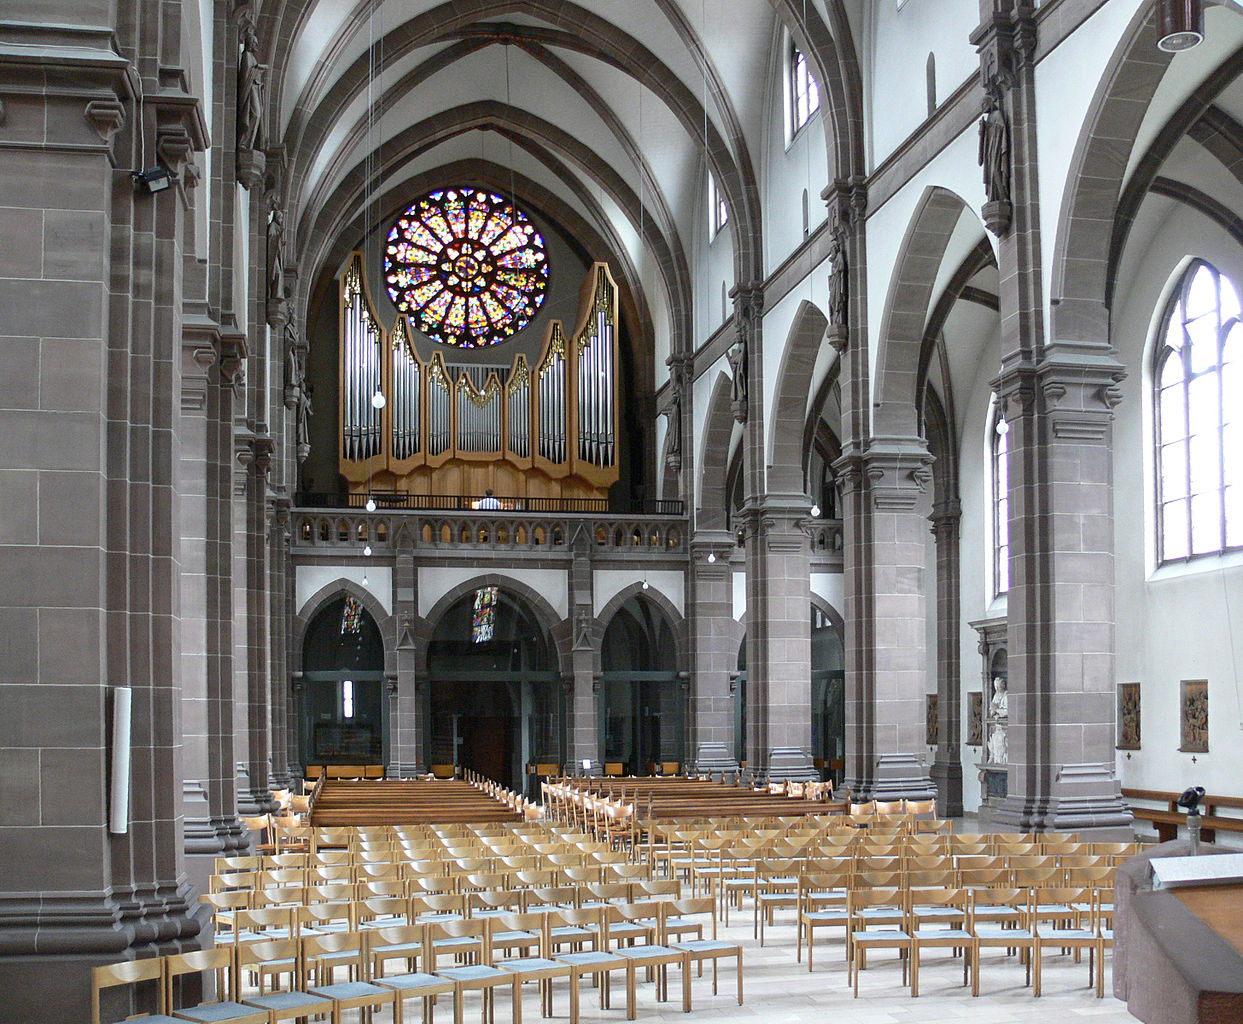 File:Mannheim Heilig-Geist-Kirche innen 2.jpg - Wikimedia